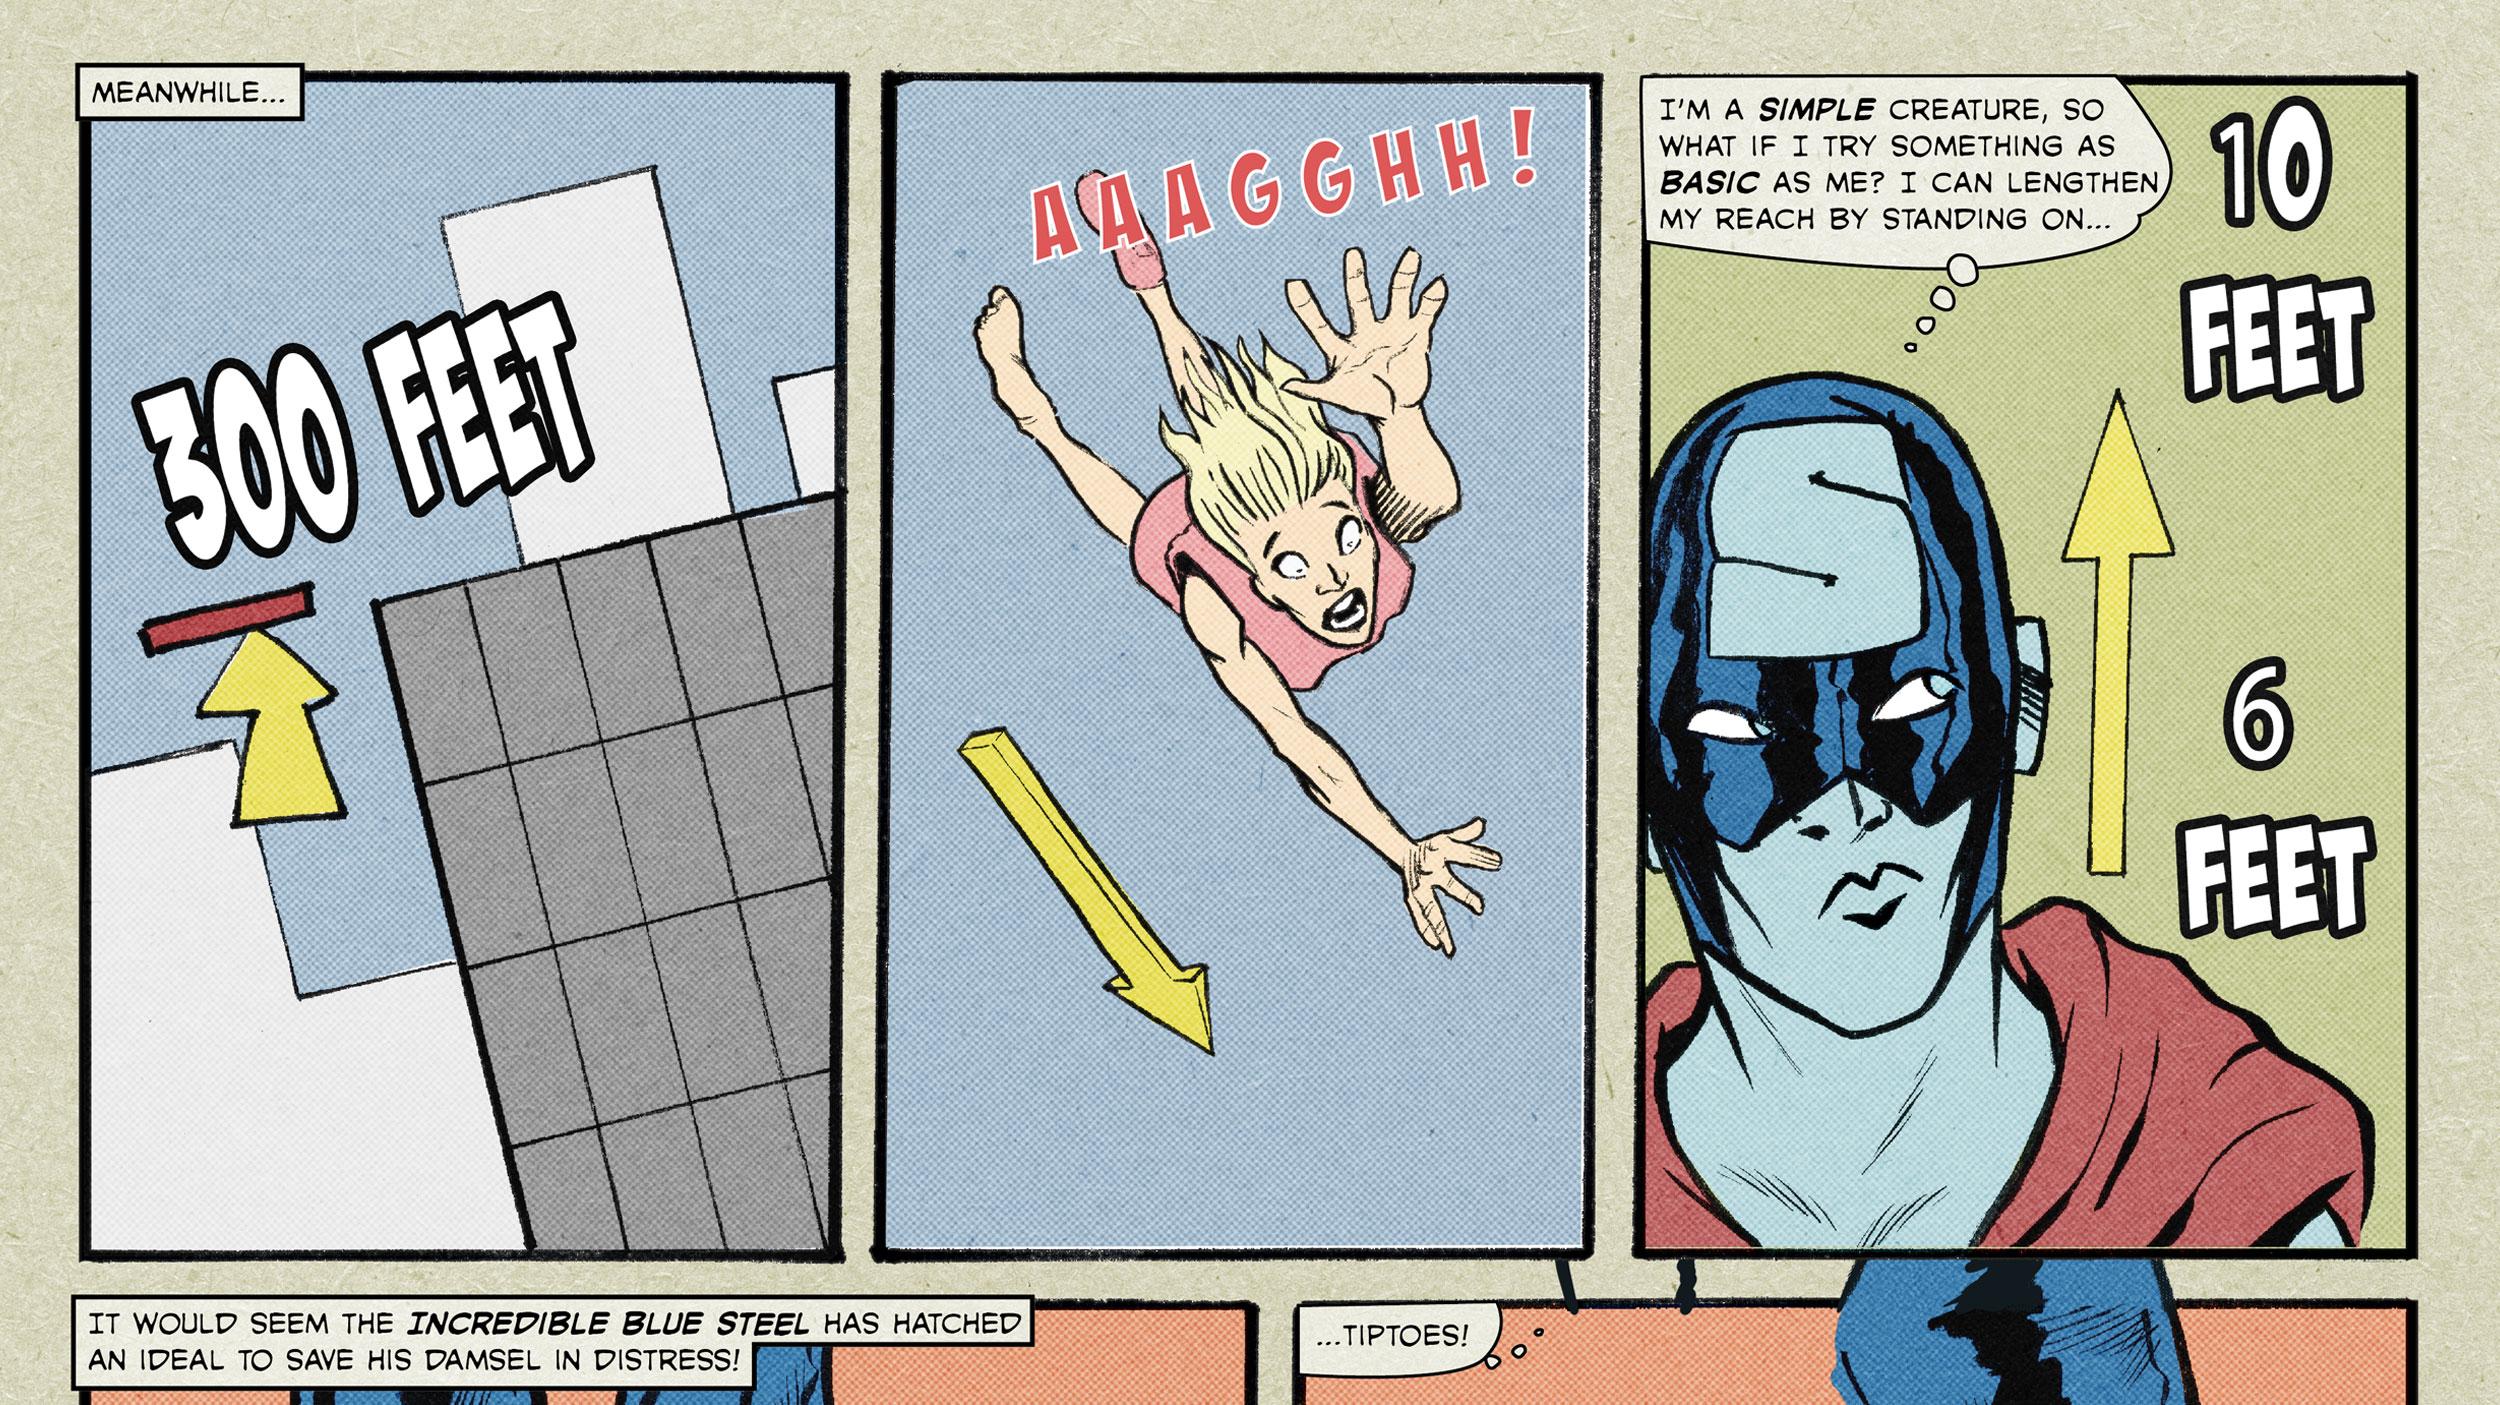 ted-joy-lin-superhero-strength-cognitive-08.jpg